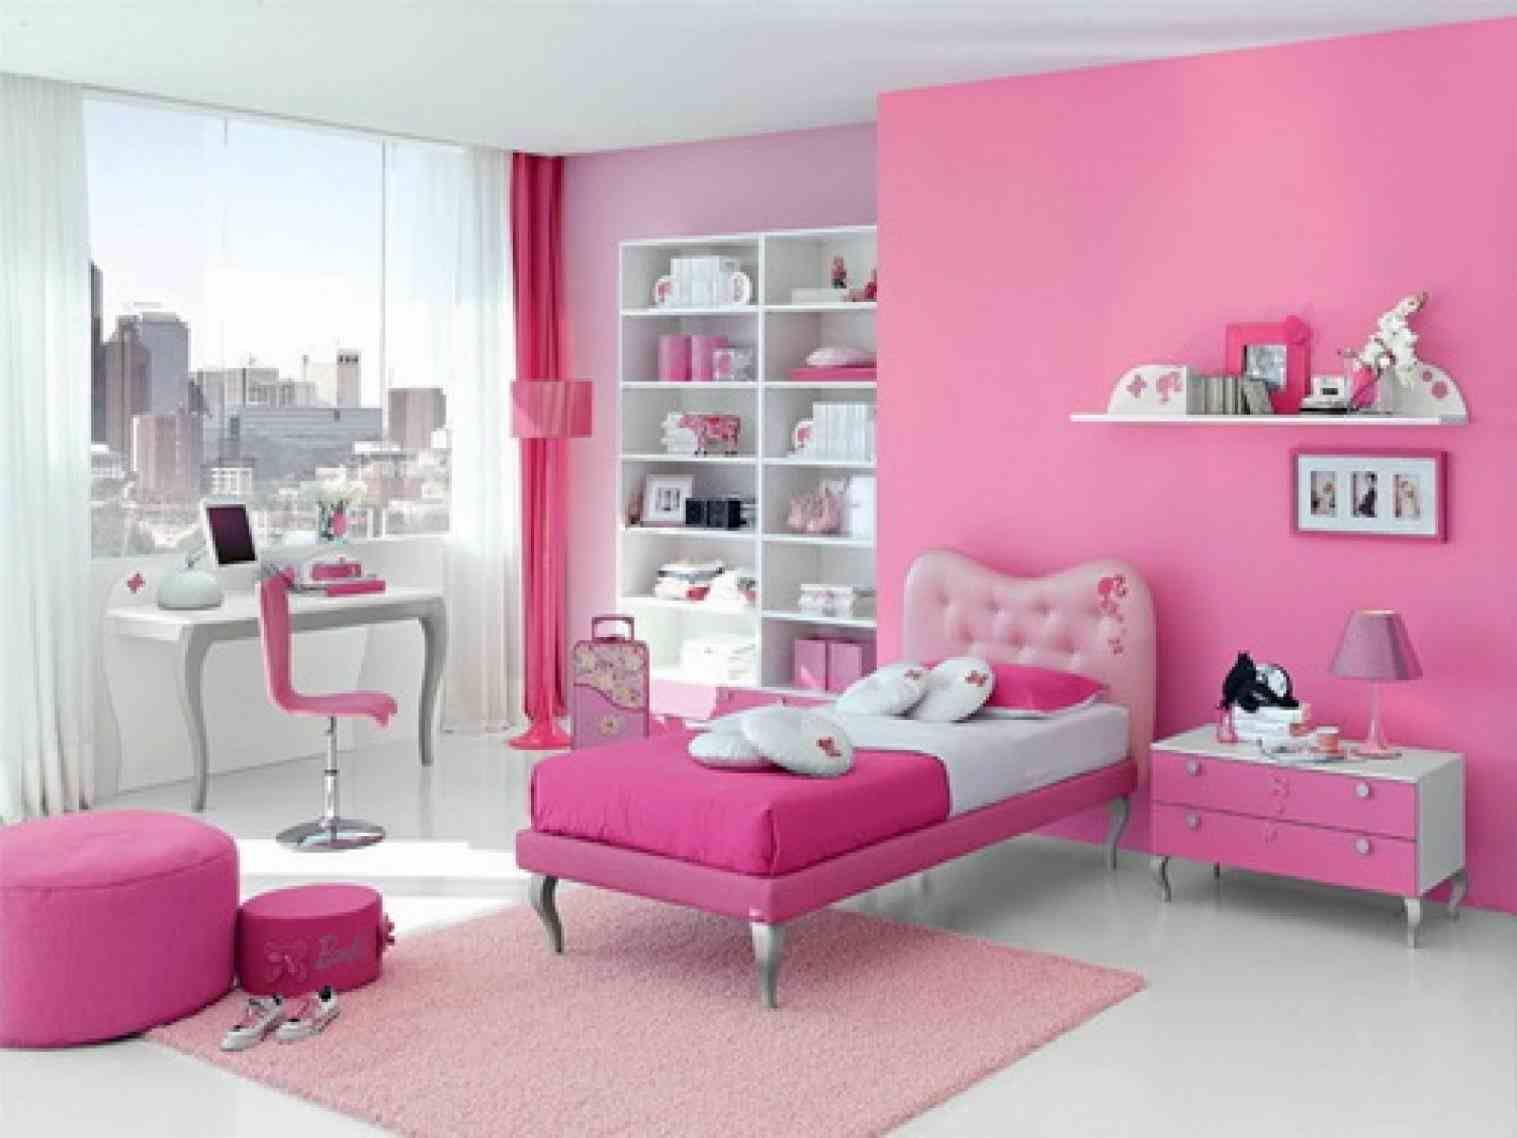 room color schemes pink | Home Ideas | Pinterest | Room color ...